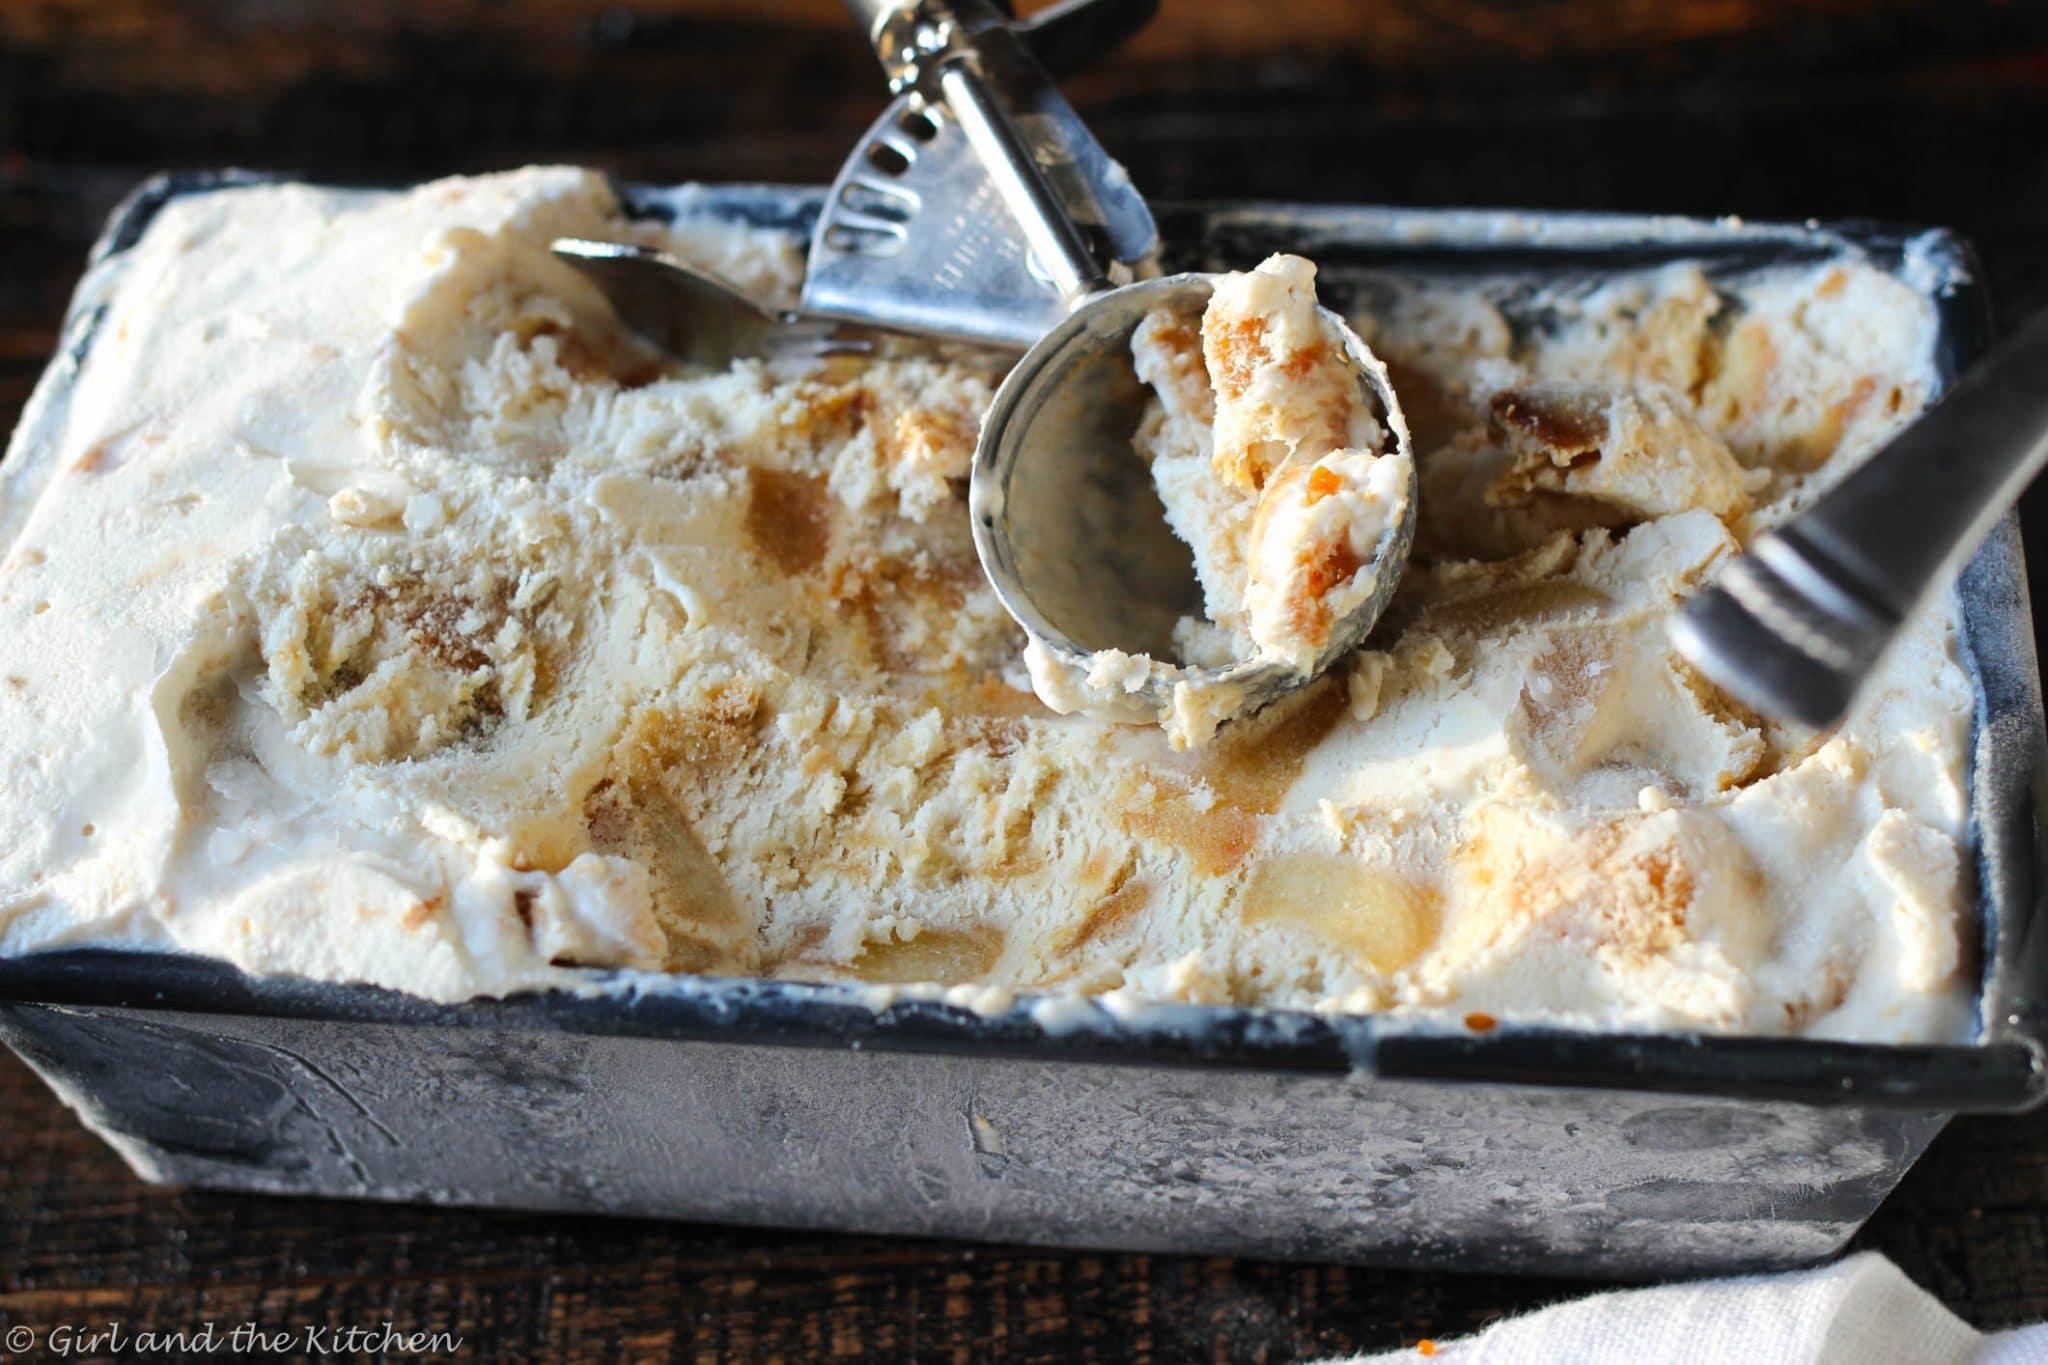 Whiskey Apple Pie No Churn Ice Cream (8 of 13)